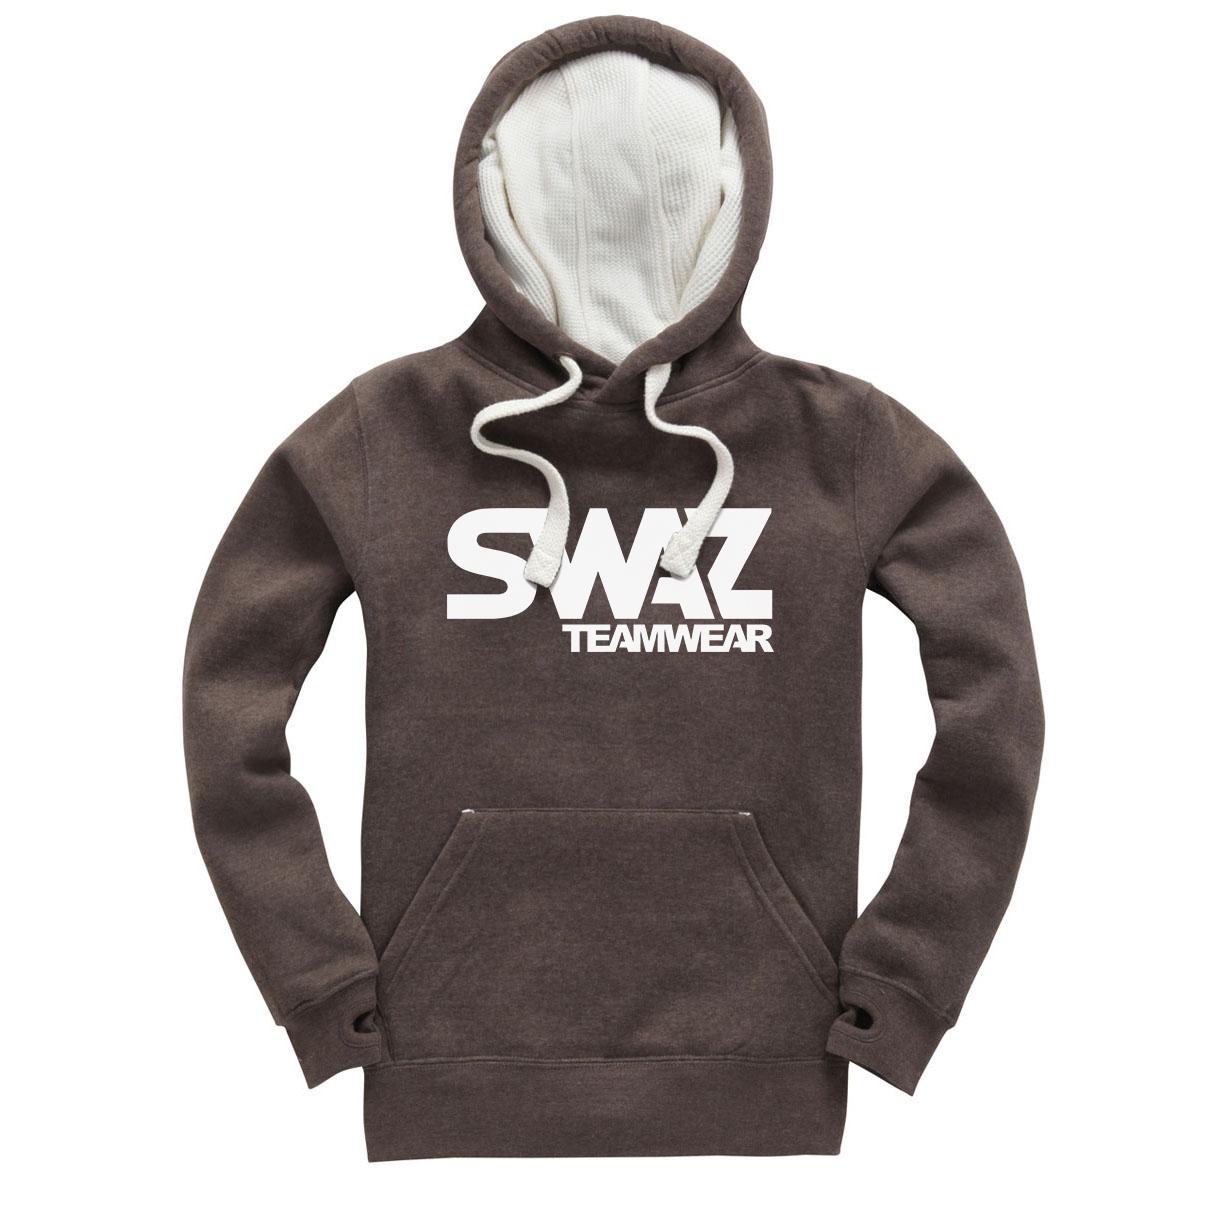 SWAZ Teamwear Classic Hoody – Graphite